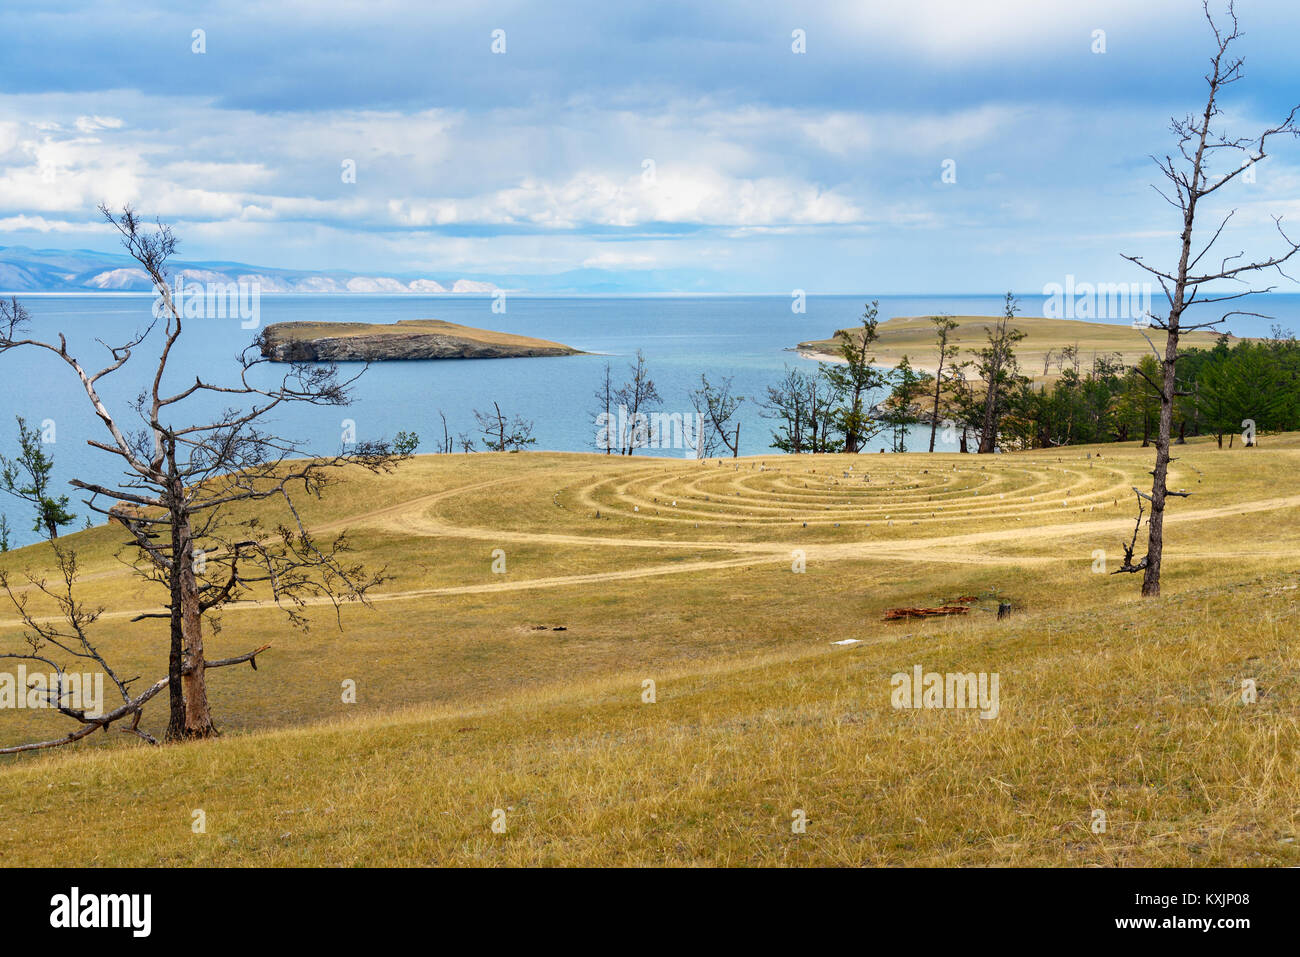 Labyrinth near Baikal lake. Kharantsi. Olkhon Island. Russia - Stock Image